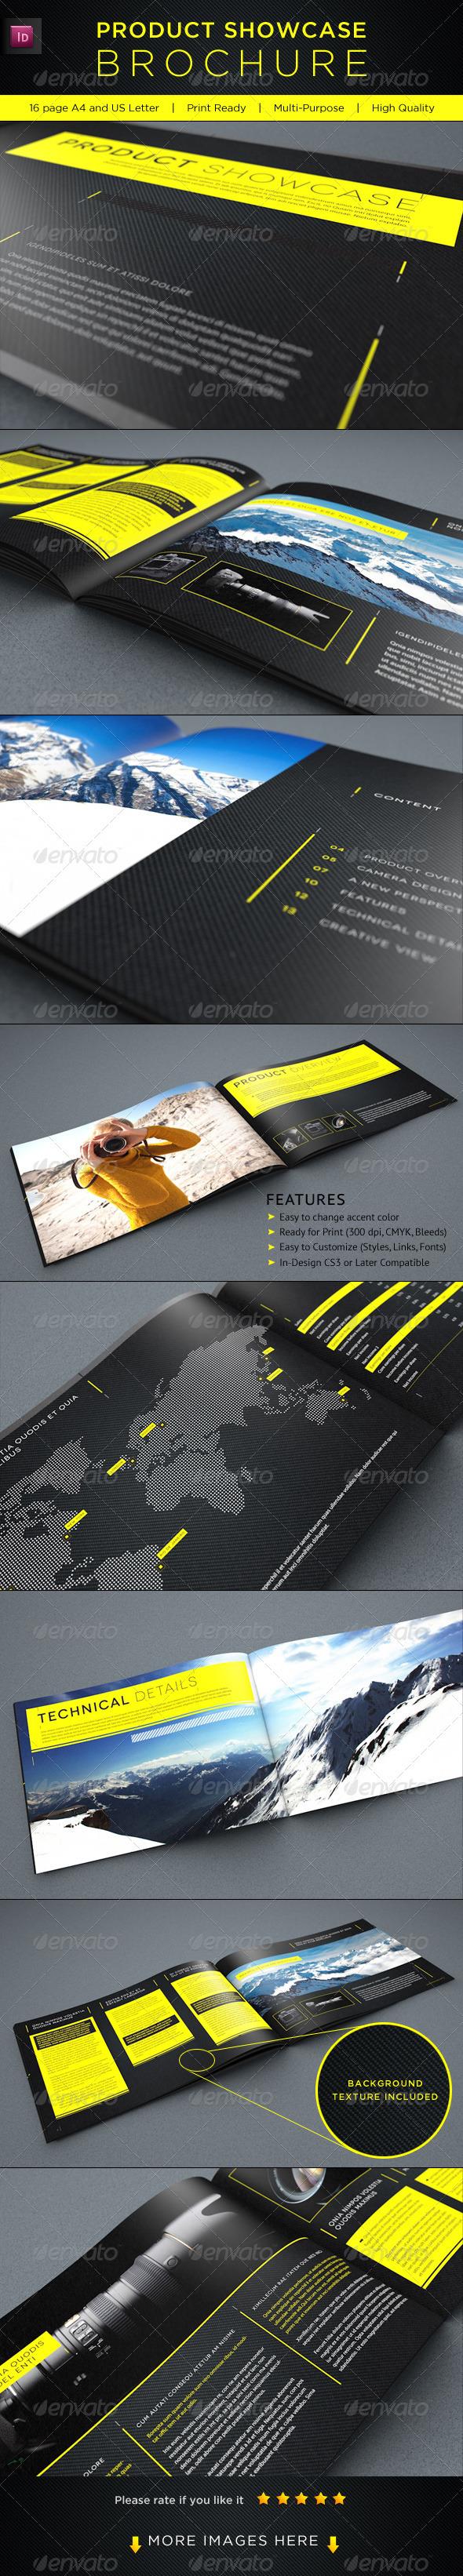 GraphicRiver Product Showcase Brochure 1573639